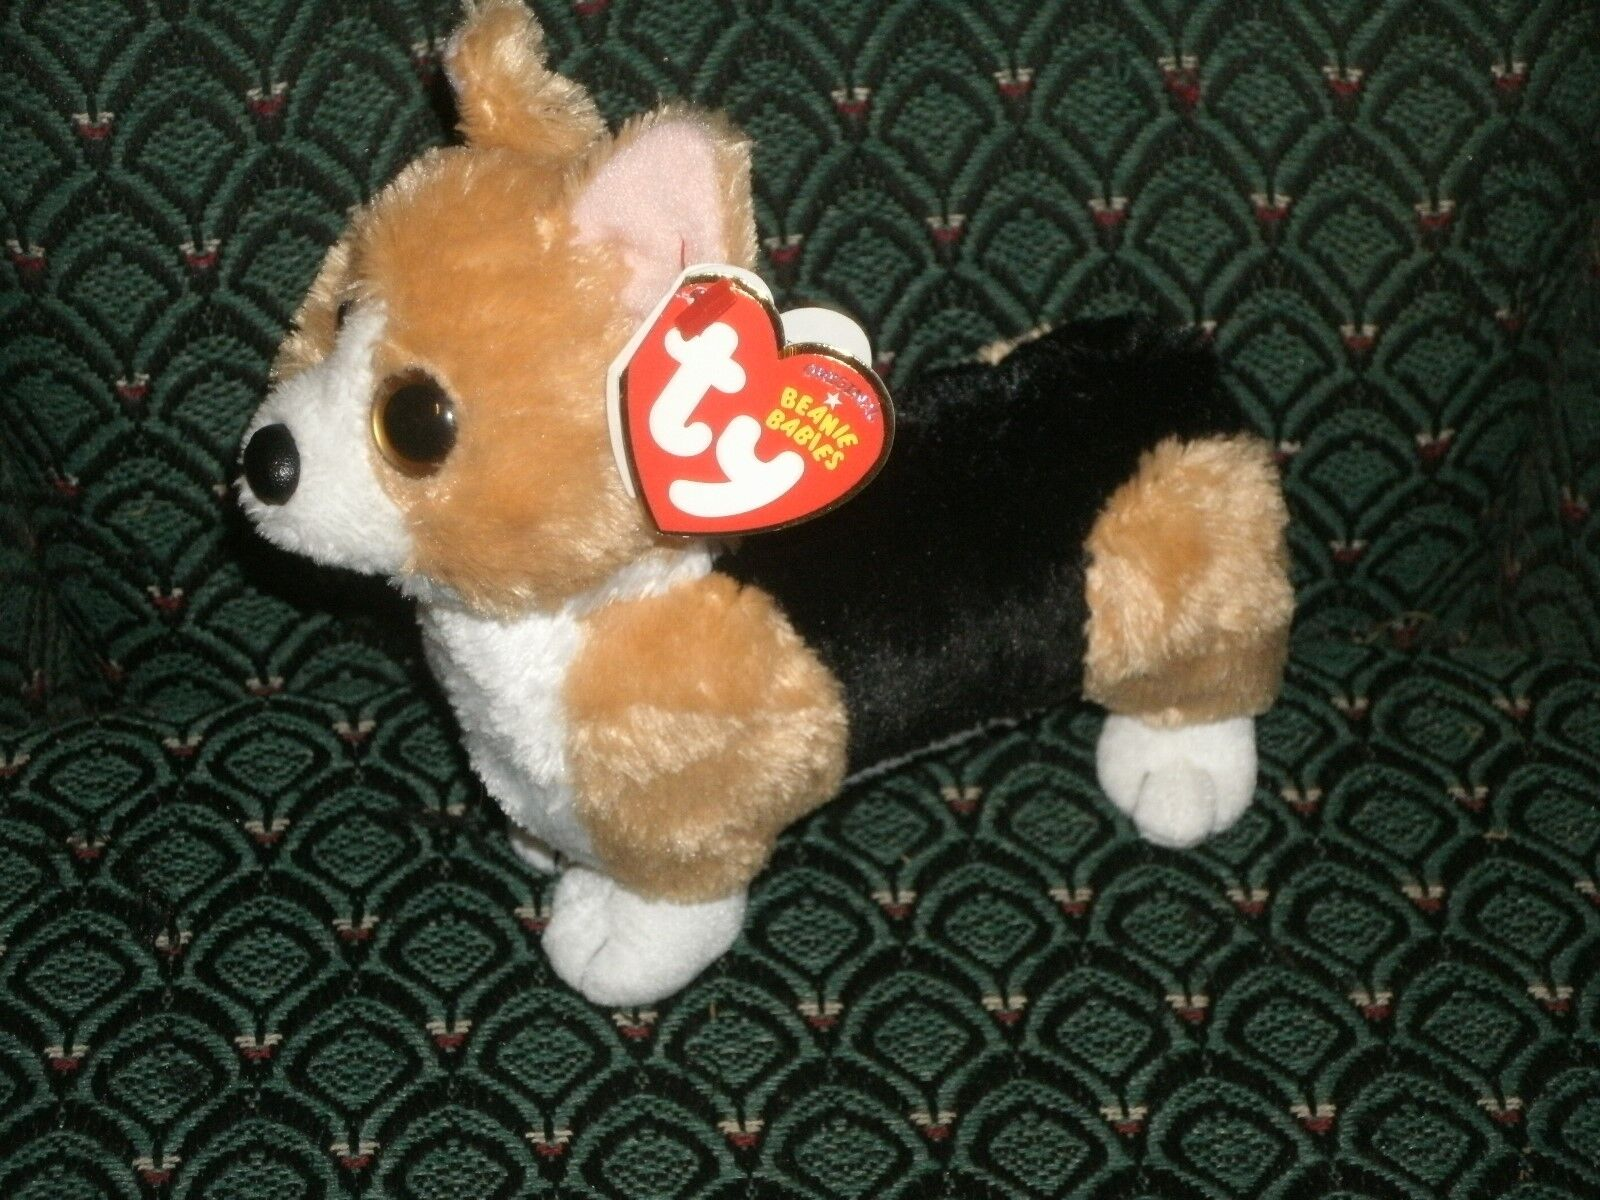 otis the dog. picture 1 of 3 otis the dog